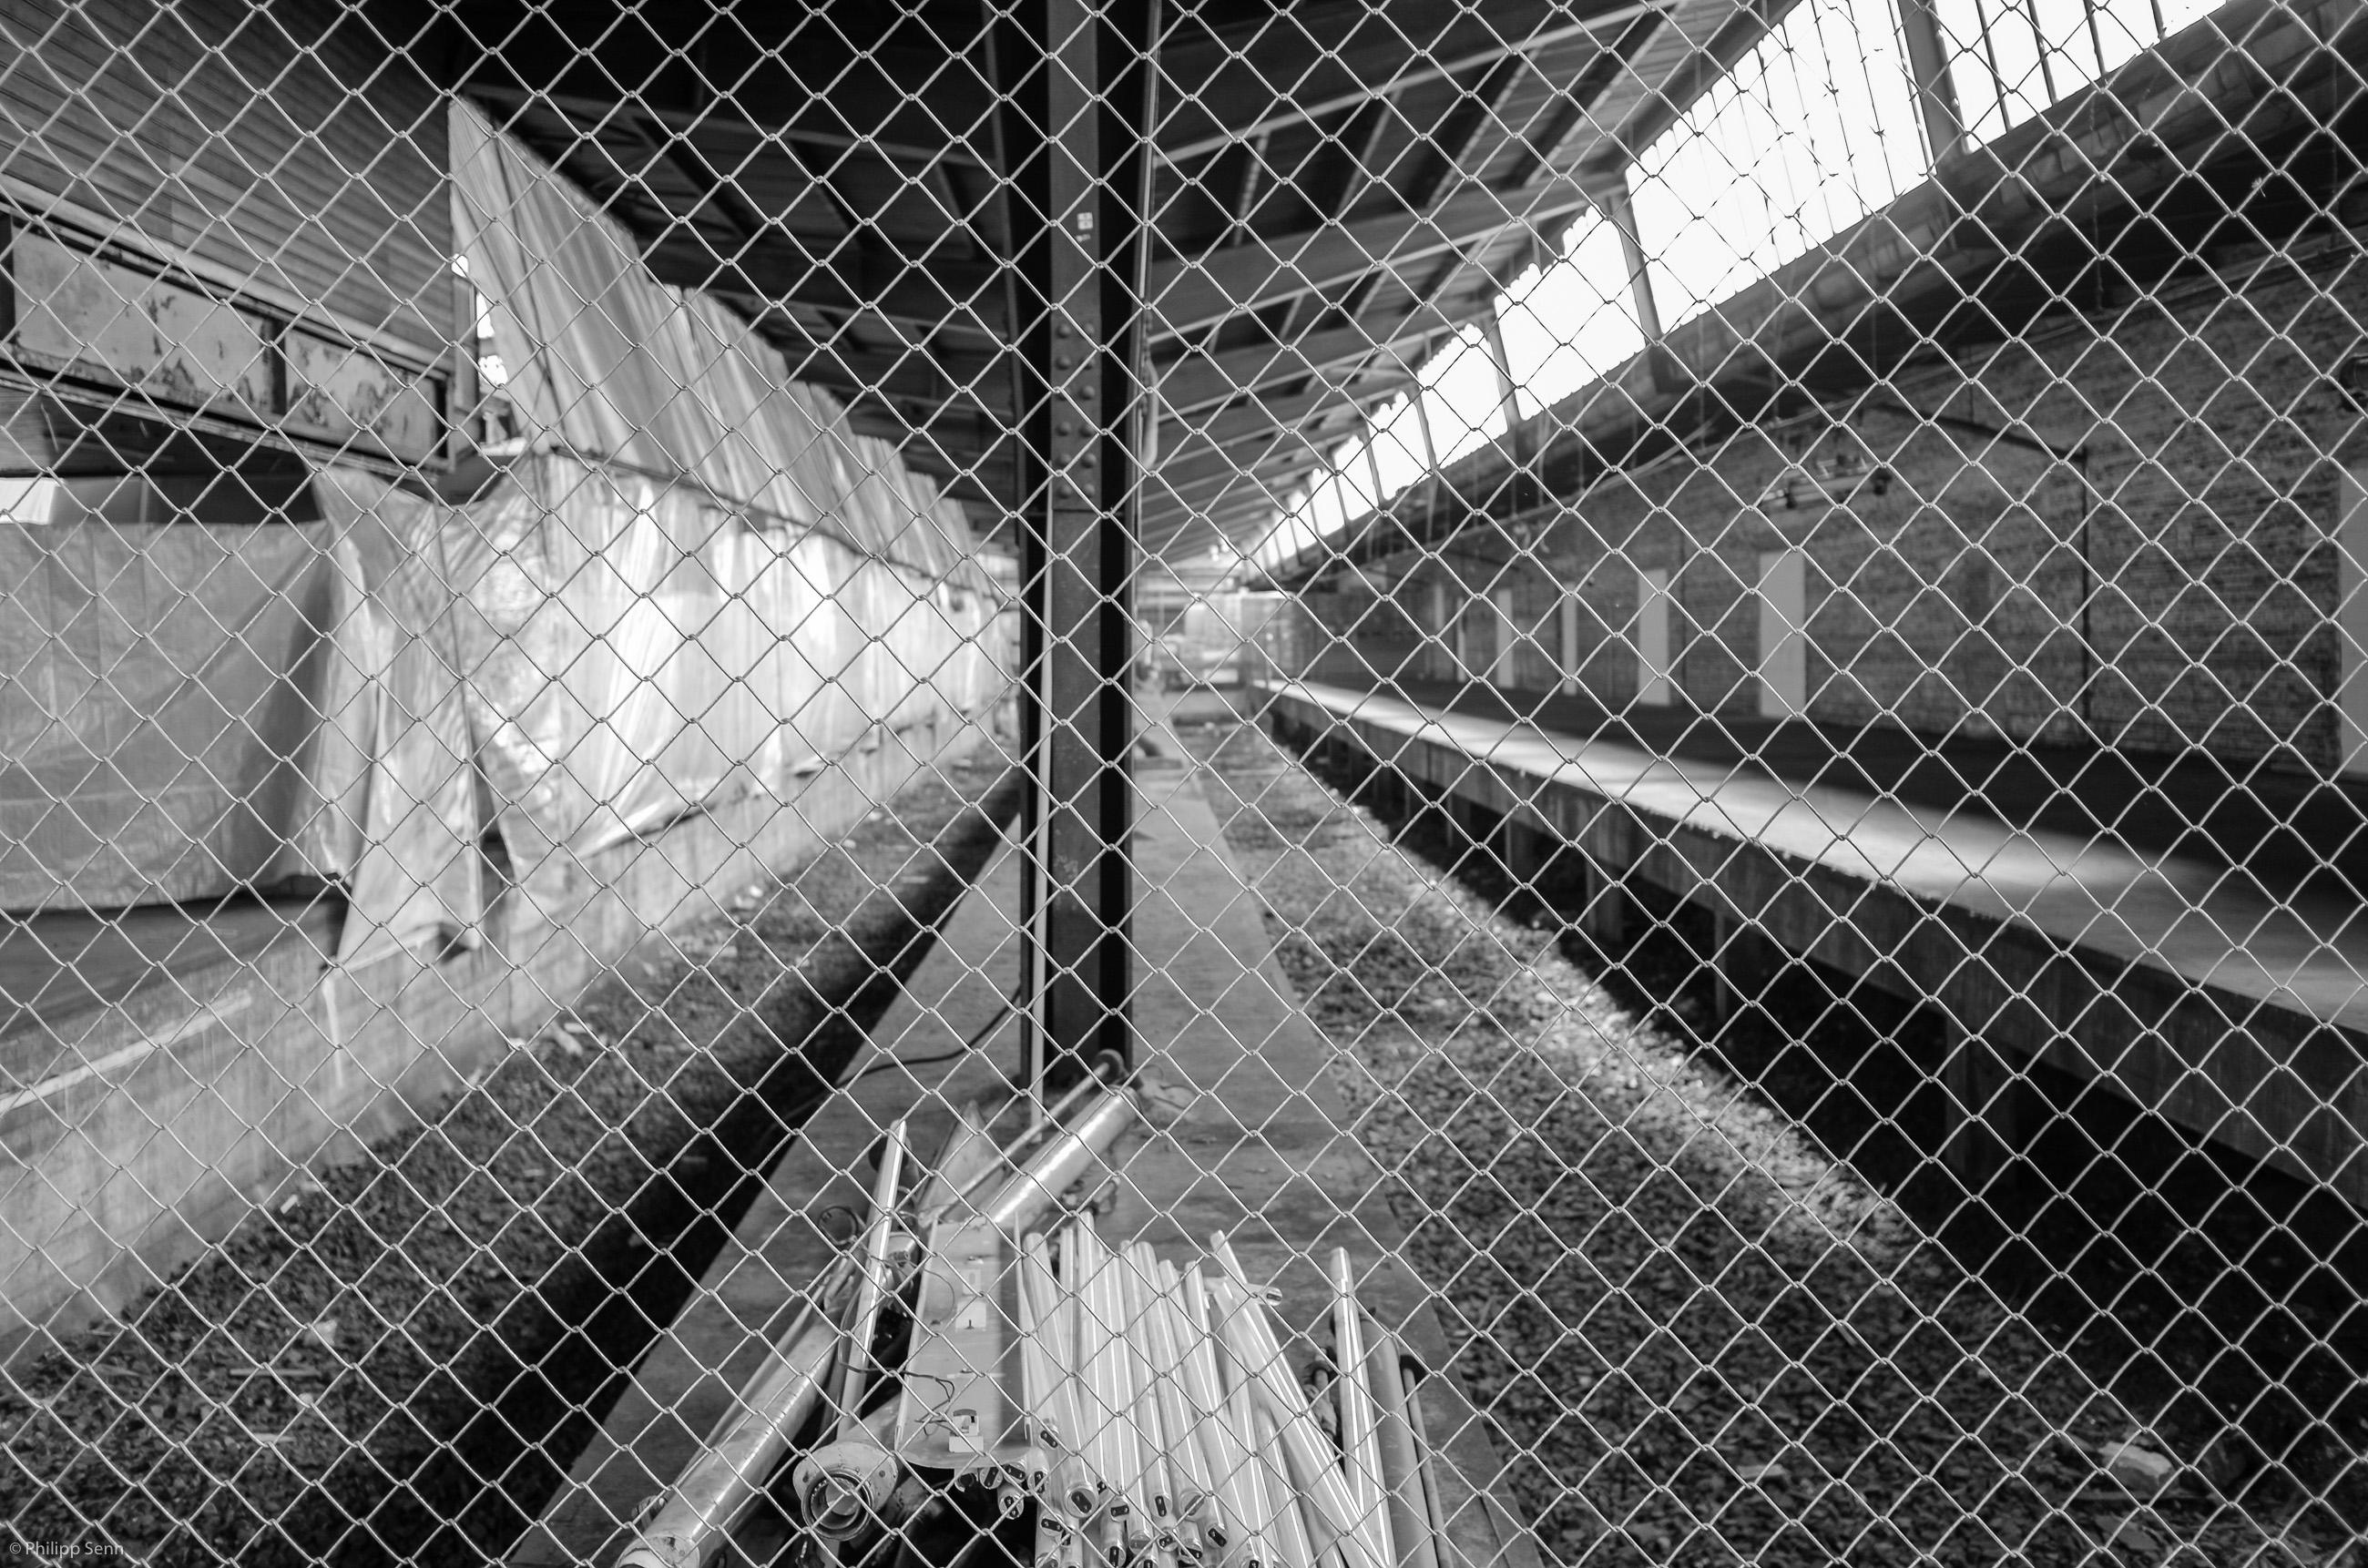 documenta alte neon roehren hinter gitterzaun